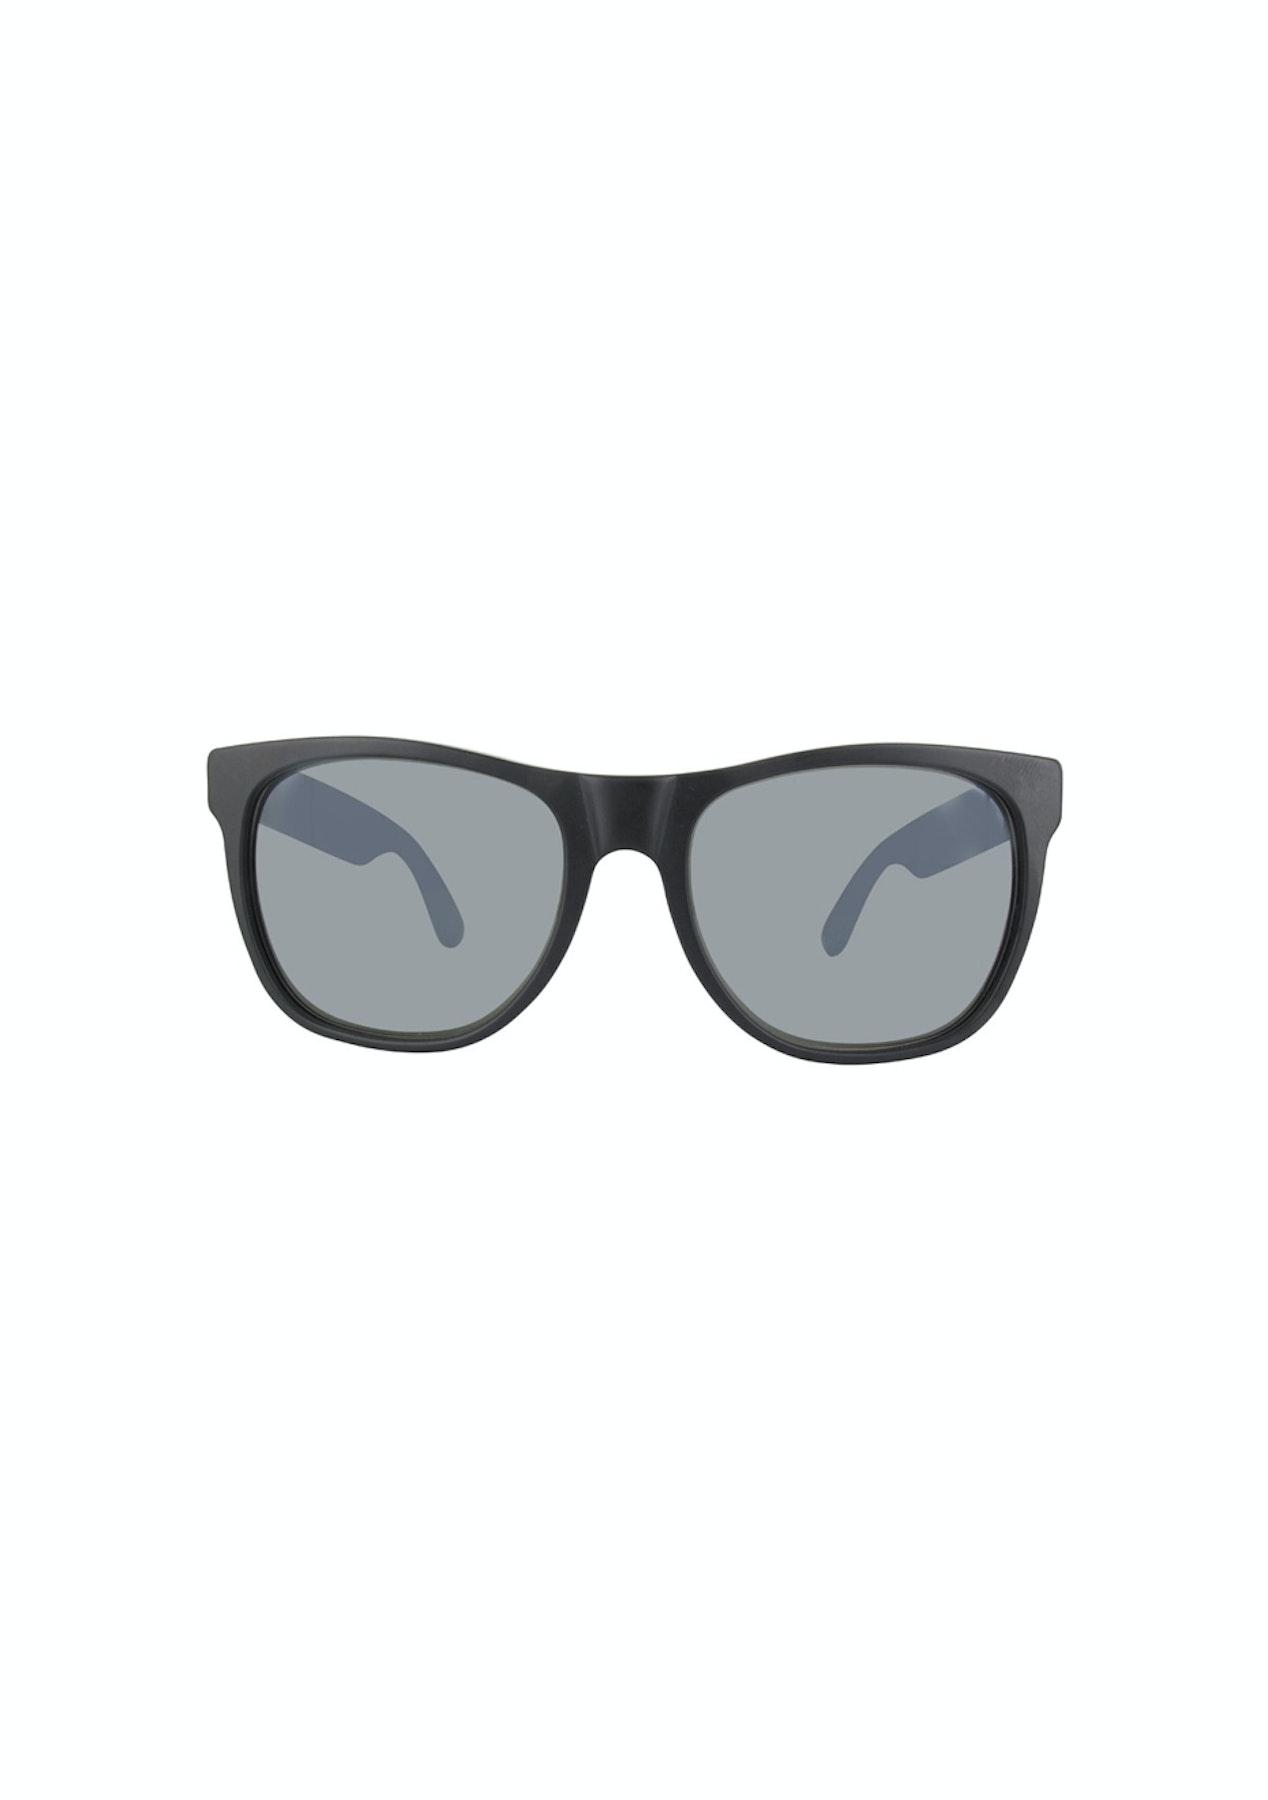 ad6ff1be4a8 Retrosuperfuture Black Sunglasses - Designer Sunglasses Sale - Onceit